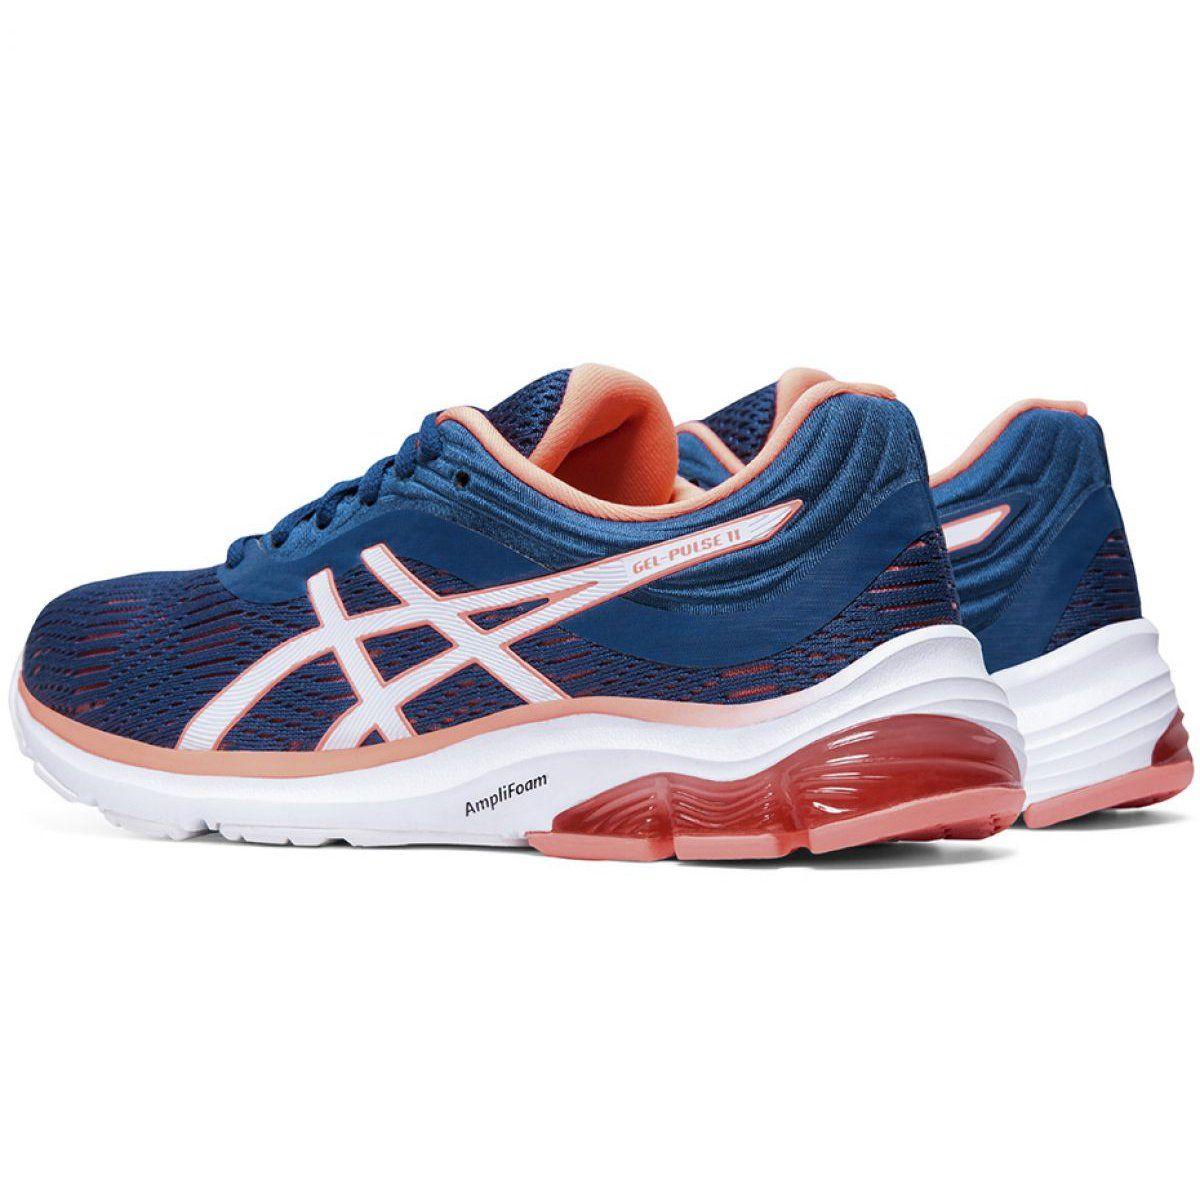 Buty Do Biegania Asics Gel Pulse W 1012a467 401 Niebieskie Blue Shoes Asics Gel Pulse Asics